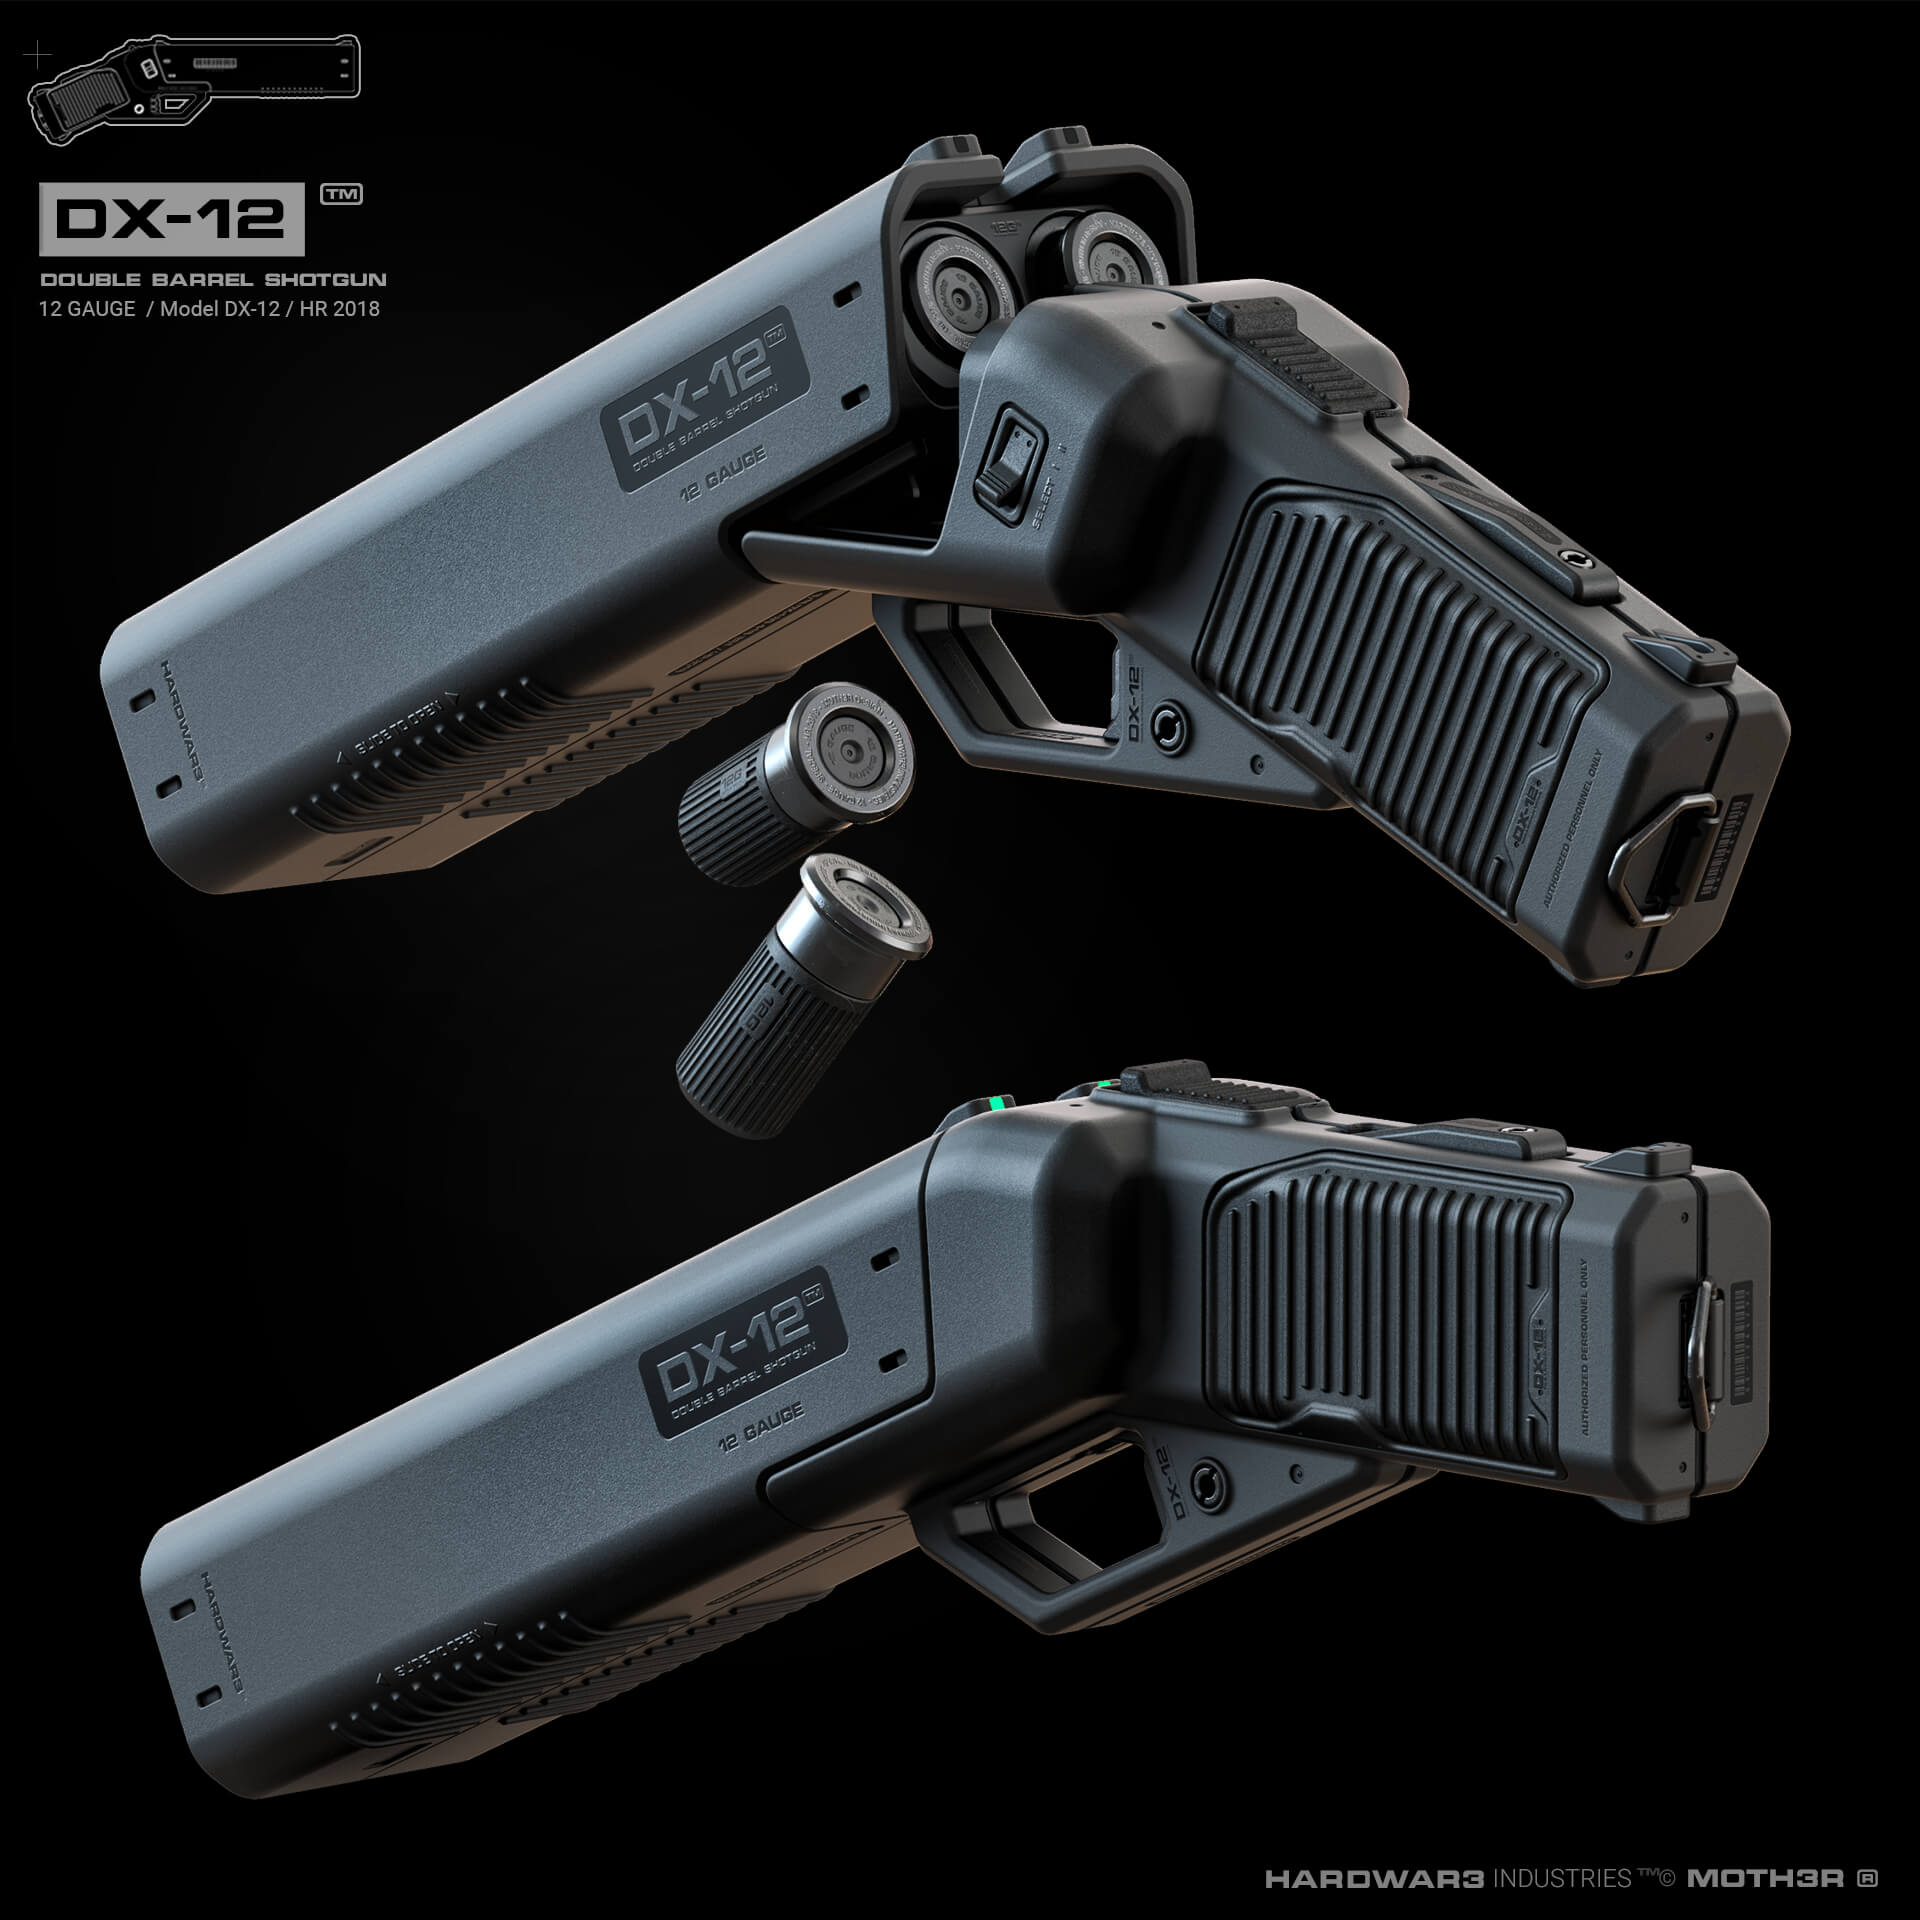 Shotgun-a06.483-484-names-02